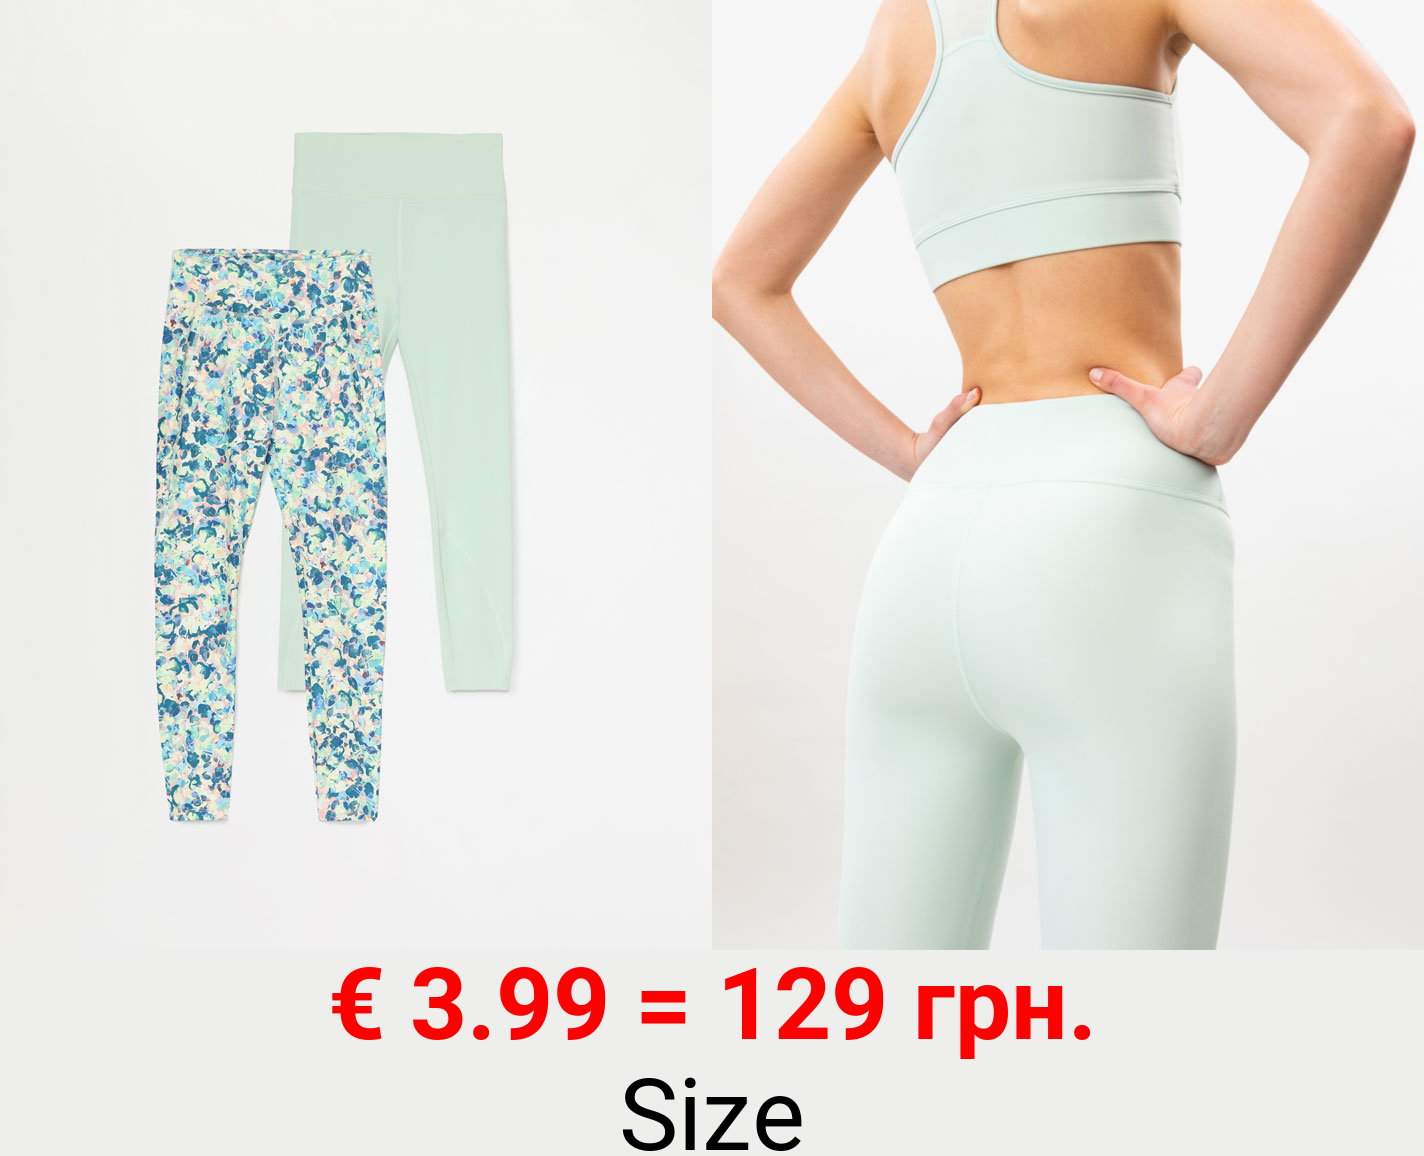 Pack of 2 pairs of sports leggings.